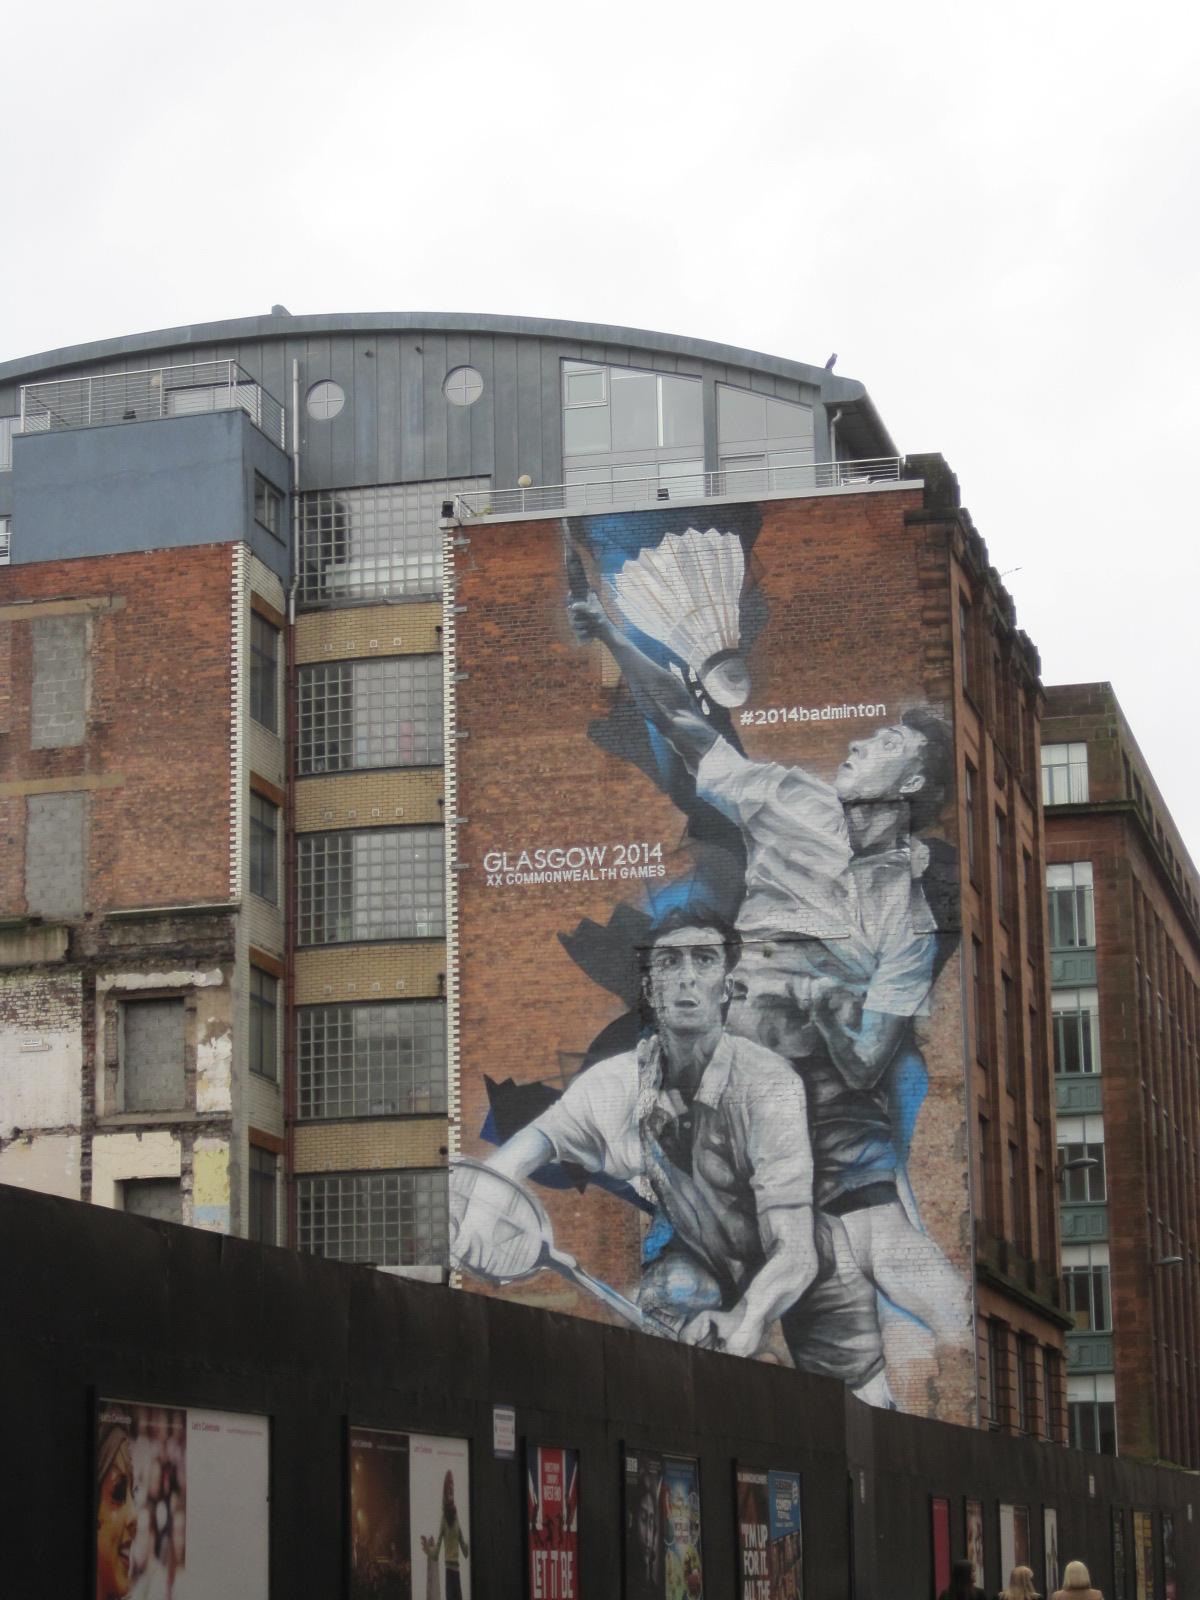 Some with wonderful graffiti